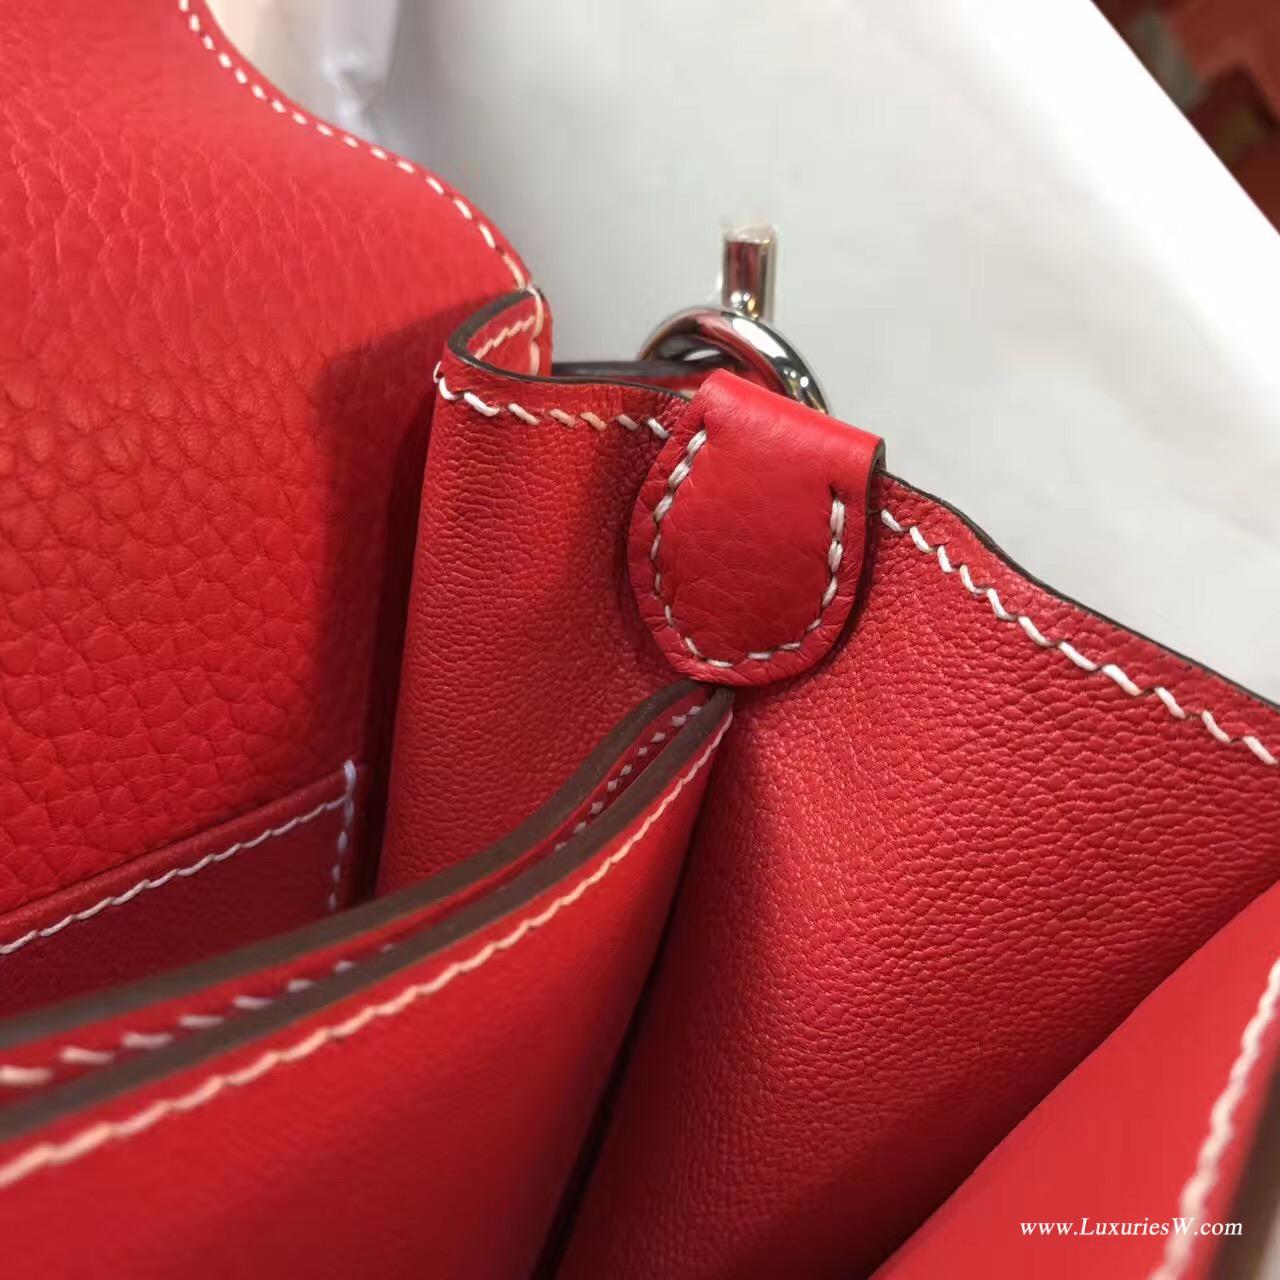 Hermes Roulis 大牛荔枝紋Q5 Rouge Cossacks 中國紅 銀扣白線